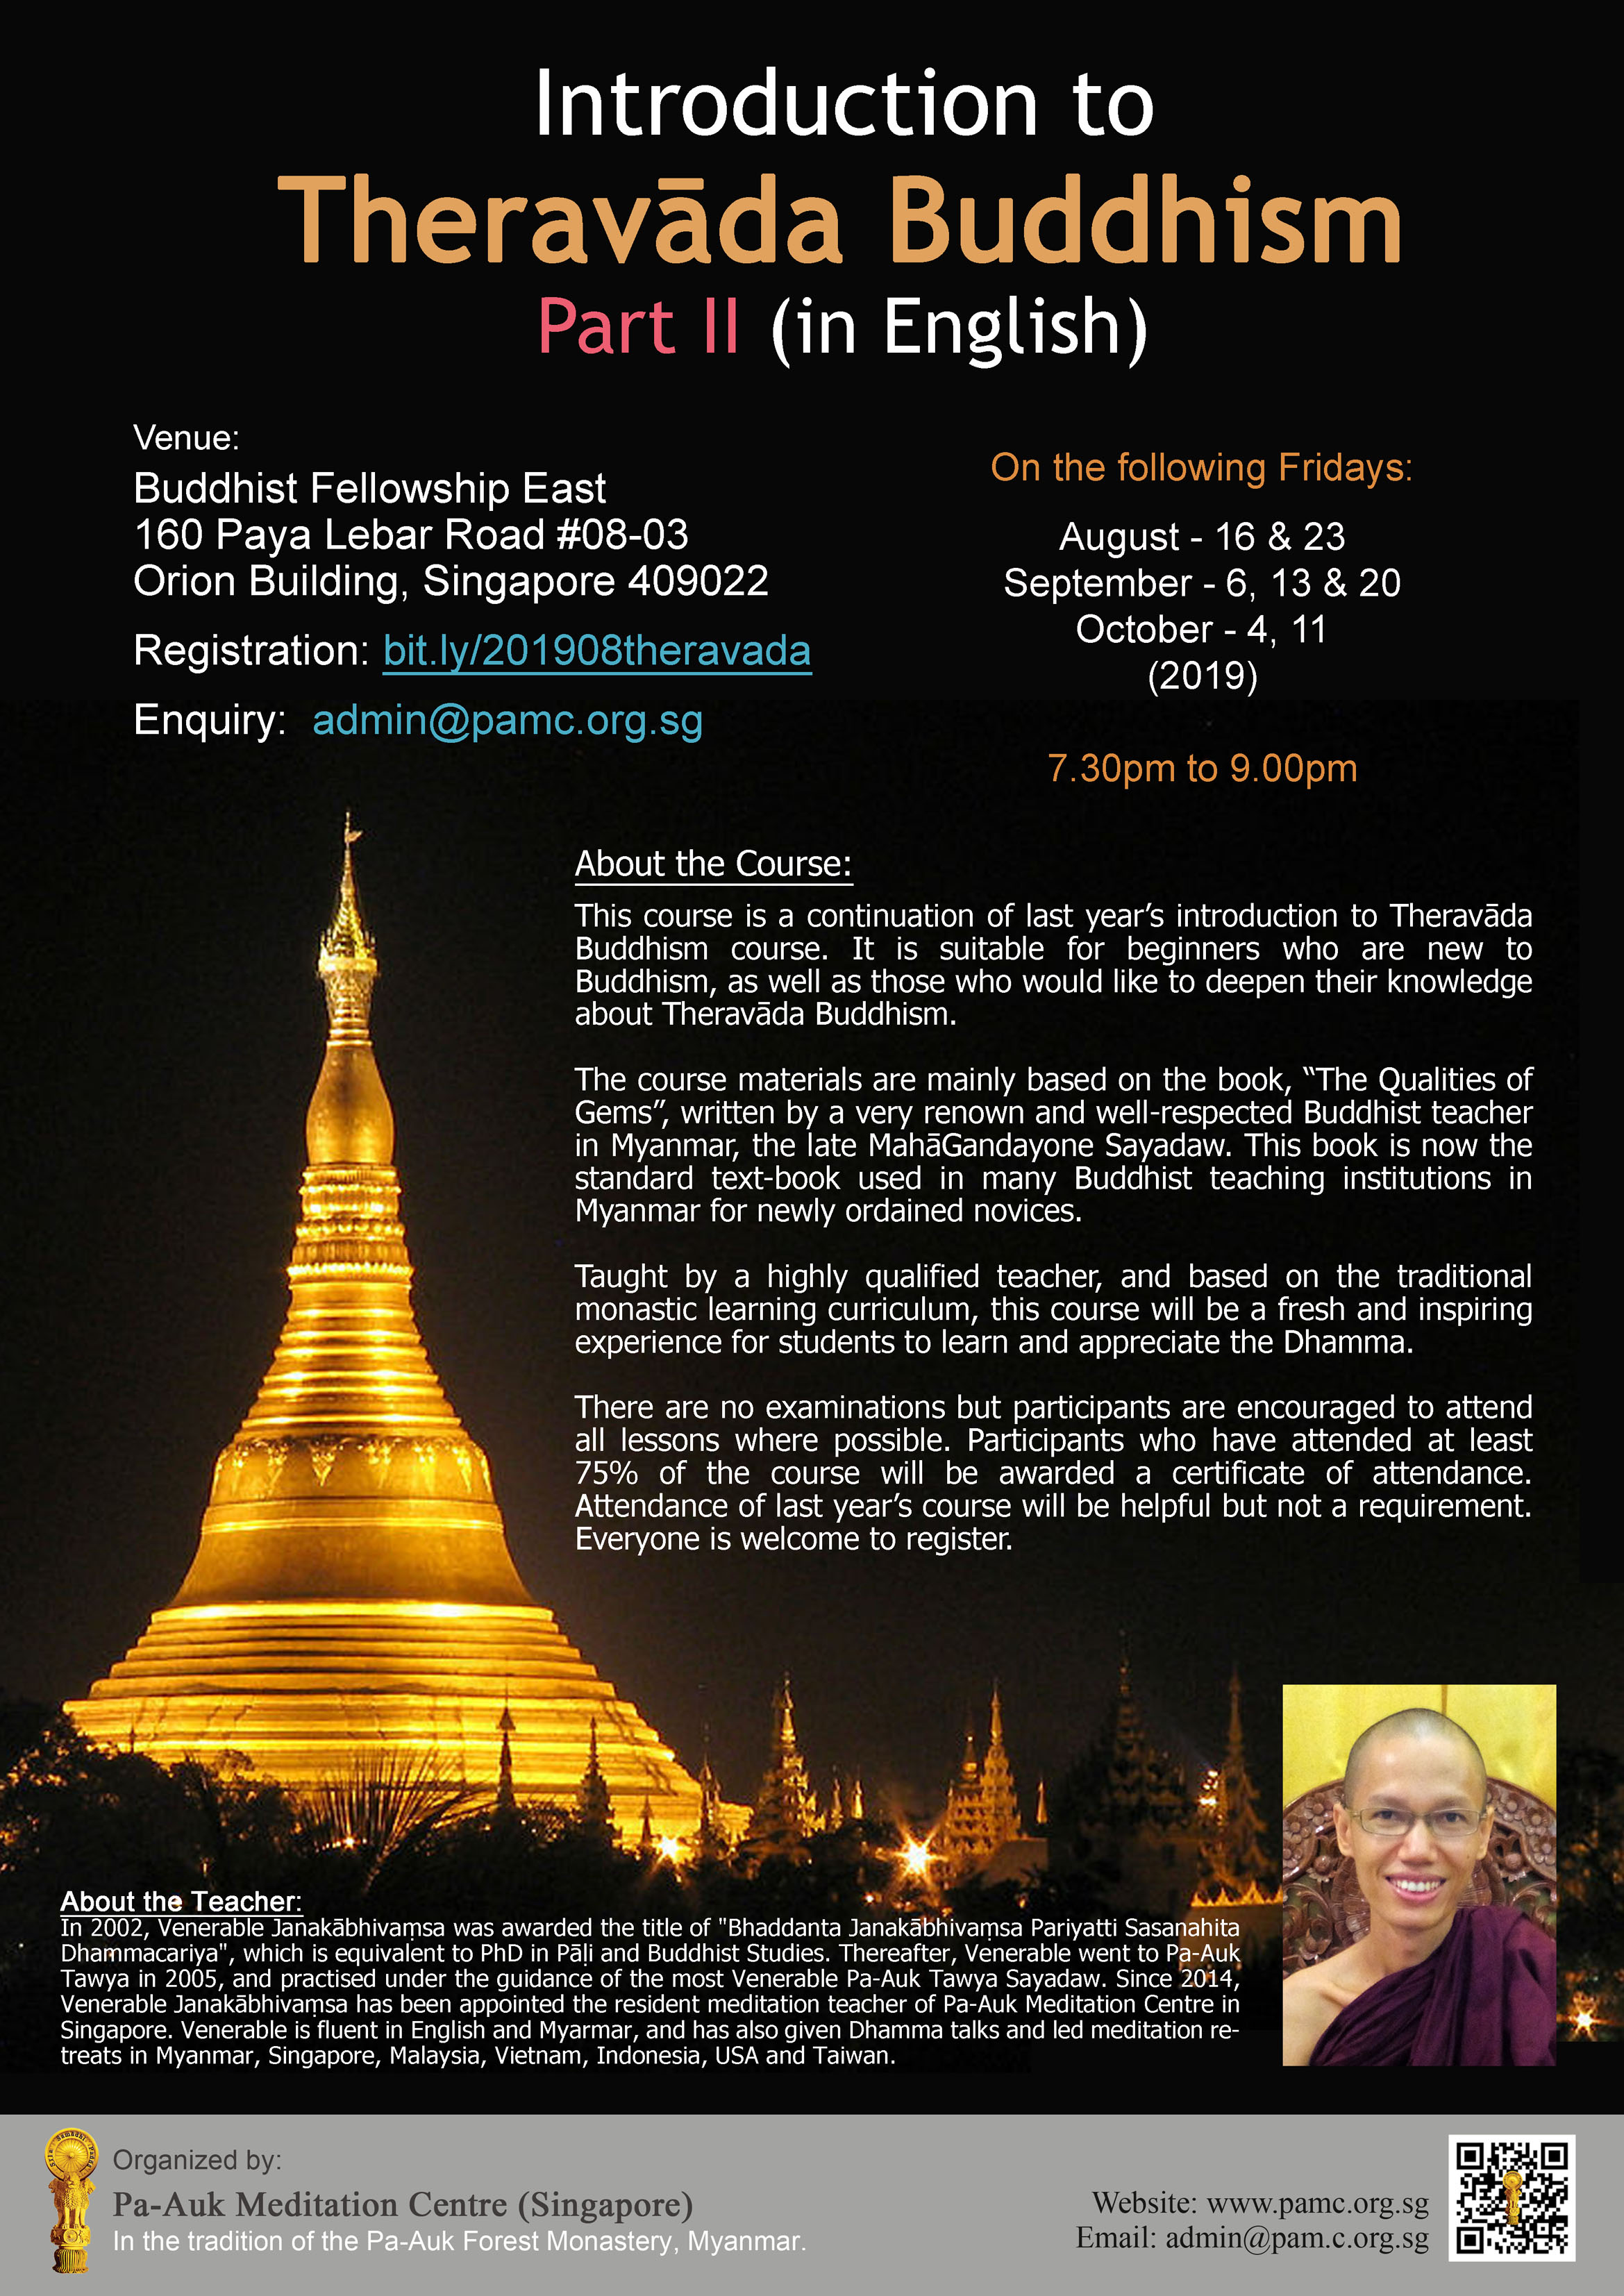 Theravāda Buddhism Part II (in English) - 16/8 to 11/10/2019